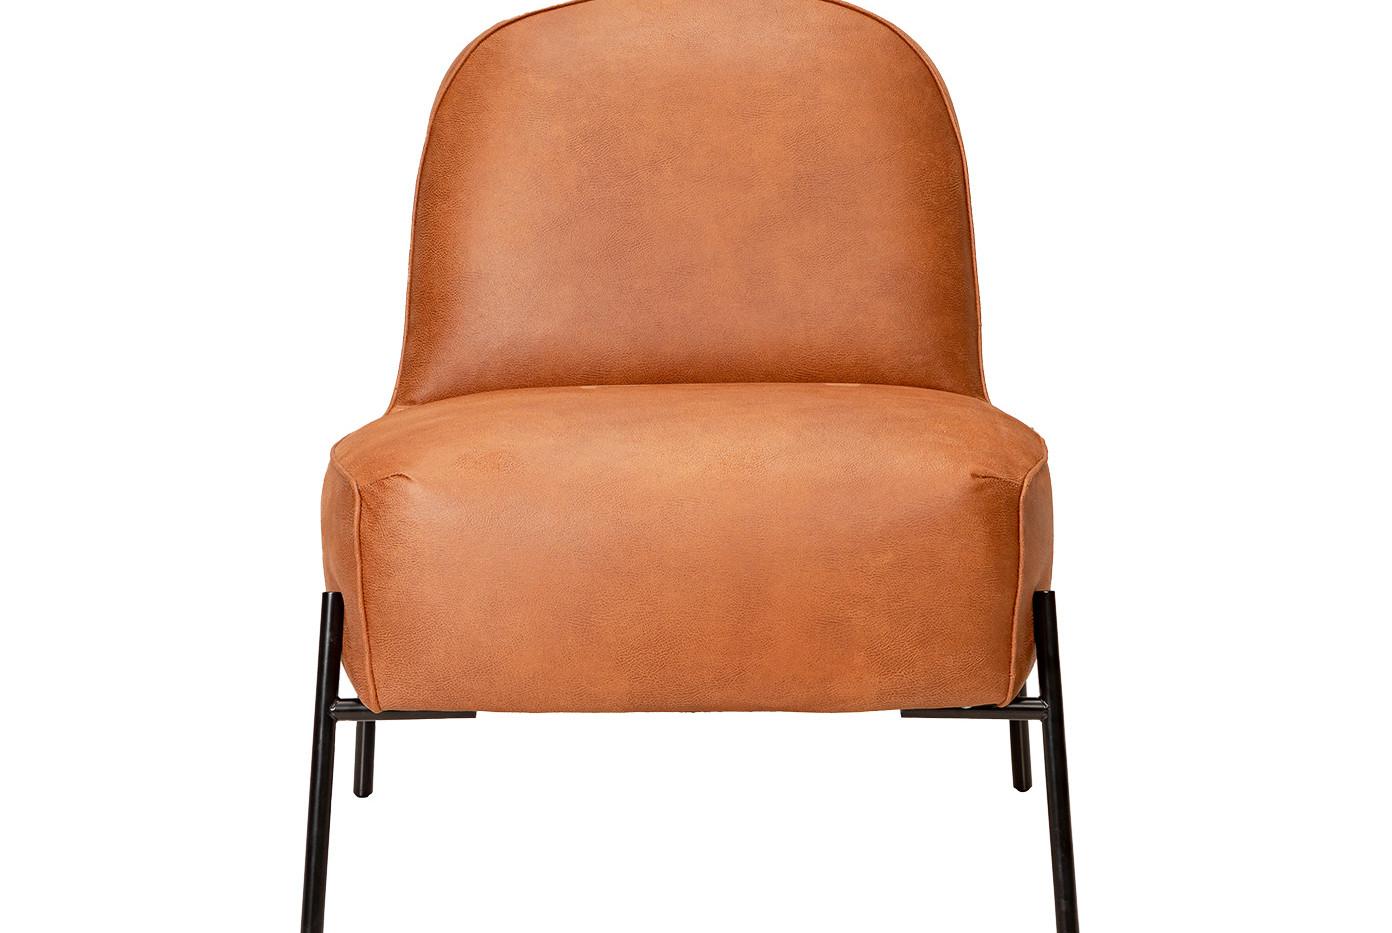 Chub chair kentucky congac